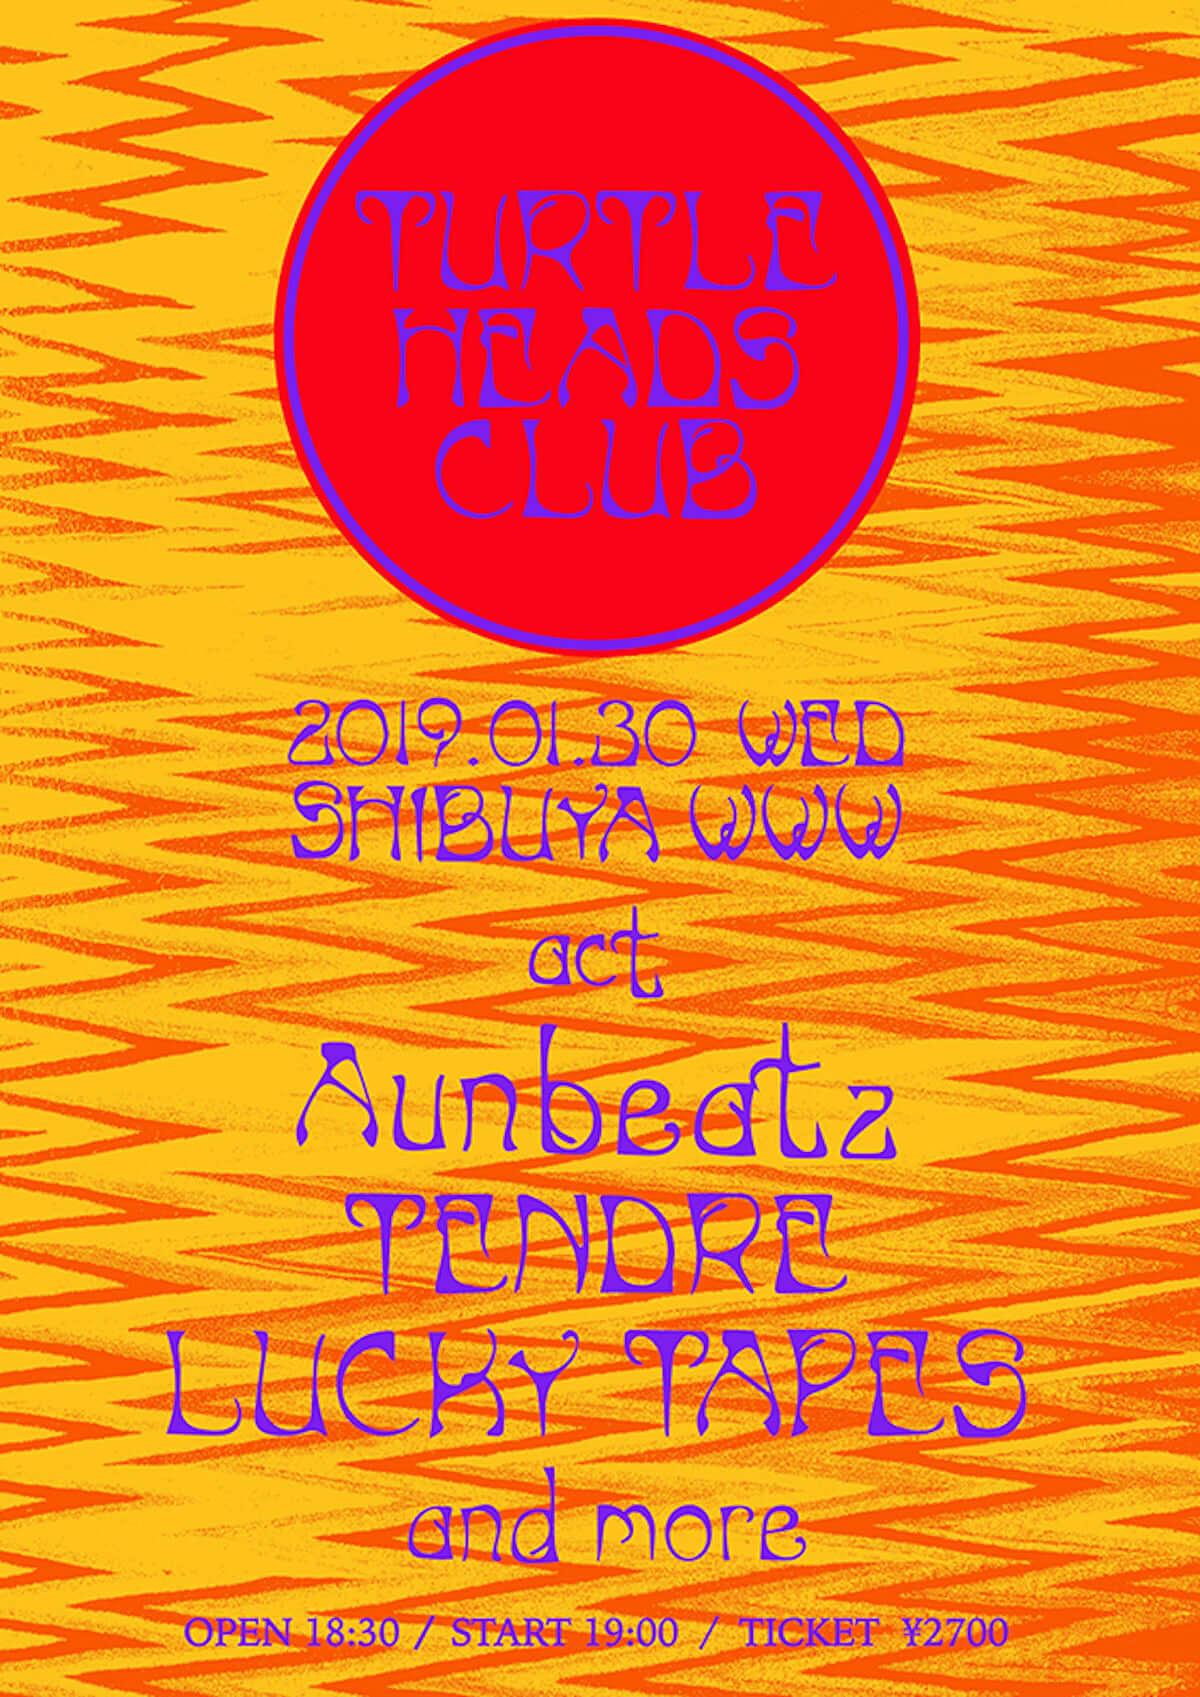 AunbeatzのKenshiroプレゼンツ!「TURTLE HEADS CLUB」にTENDREやLUCKY TAPESらが登場 music181125-turtle-heads-club-2-1200x1697